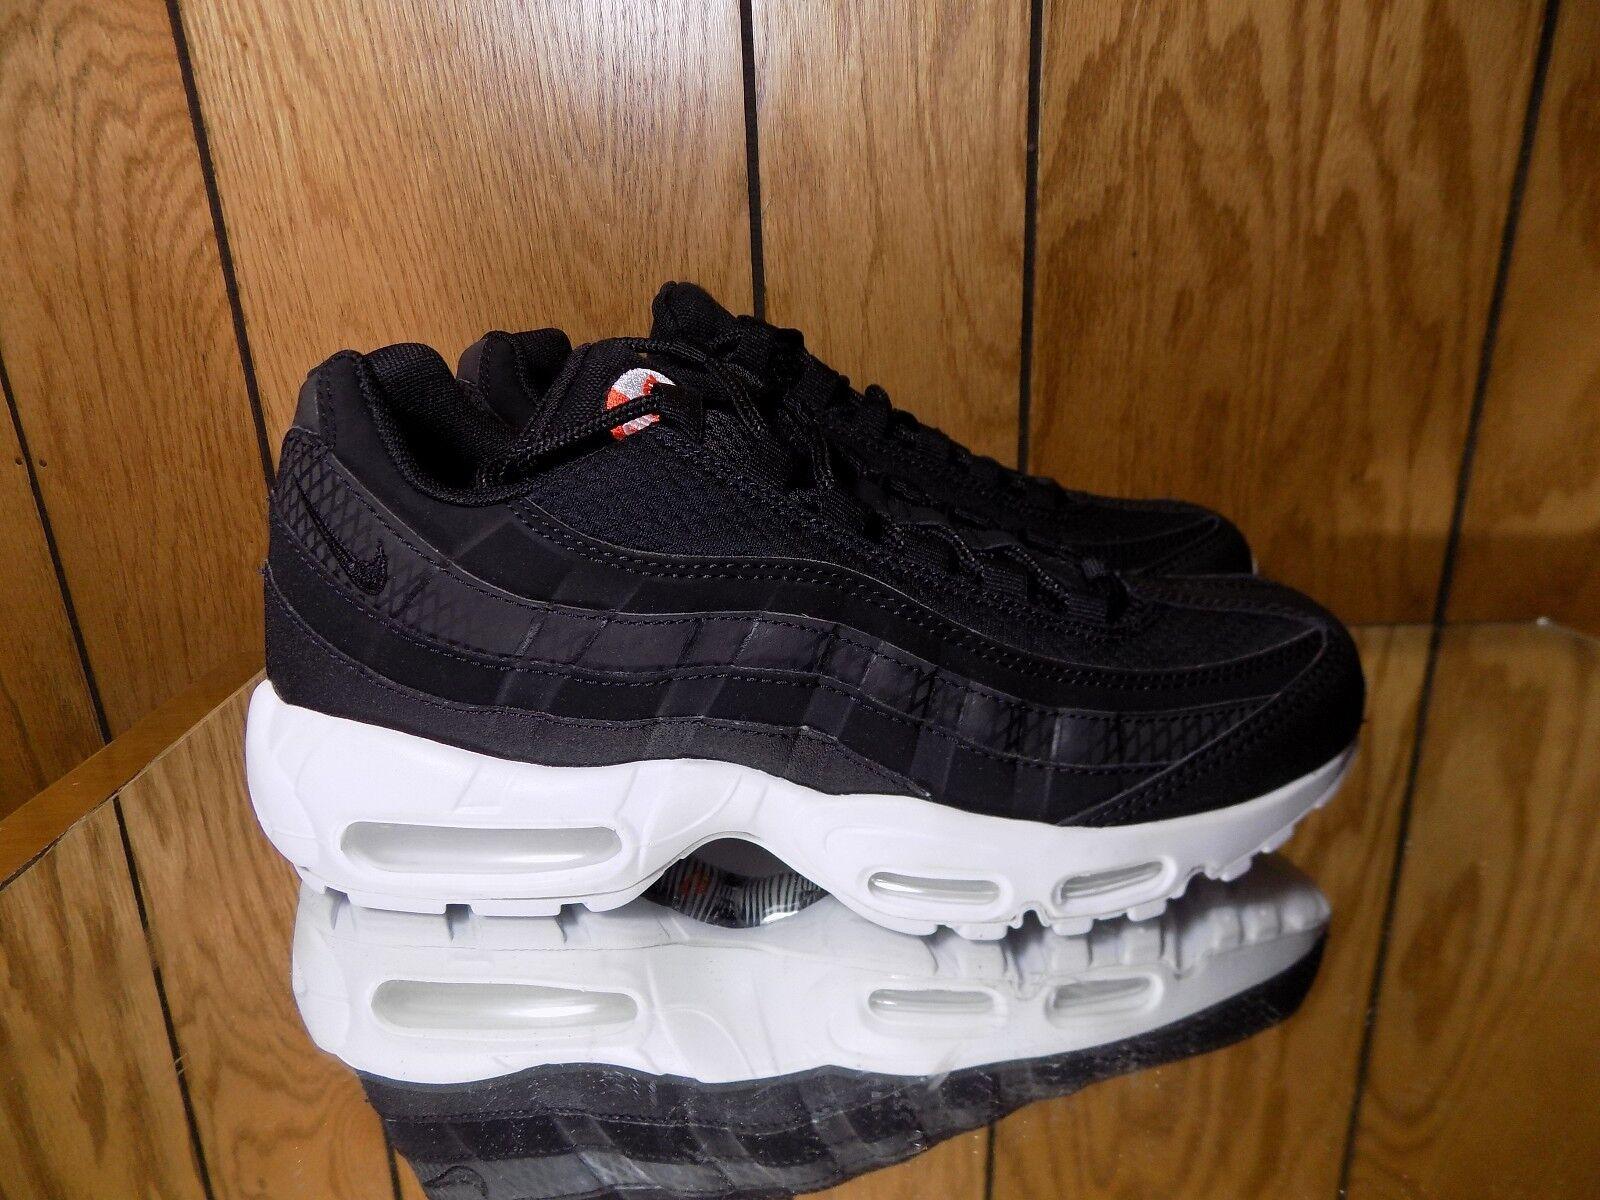 NIKE AIR MAX 95 PREMIUM SE BLACK WHITE ORANGE 924478 001 MEN'S SIZE 7 The most popular shoes for men and women